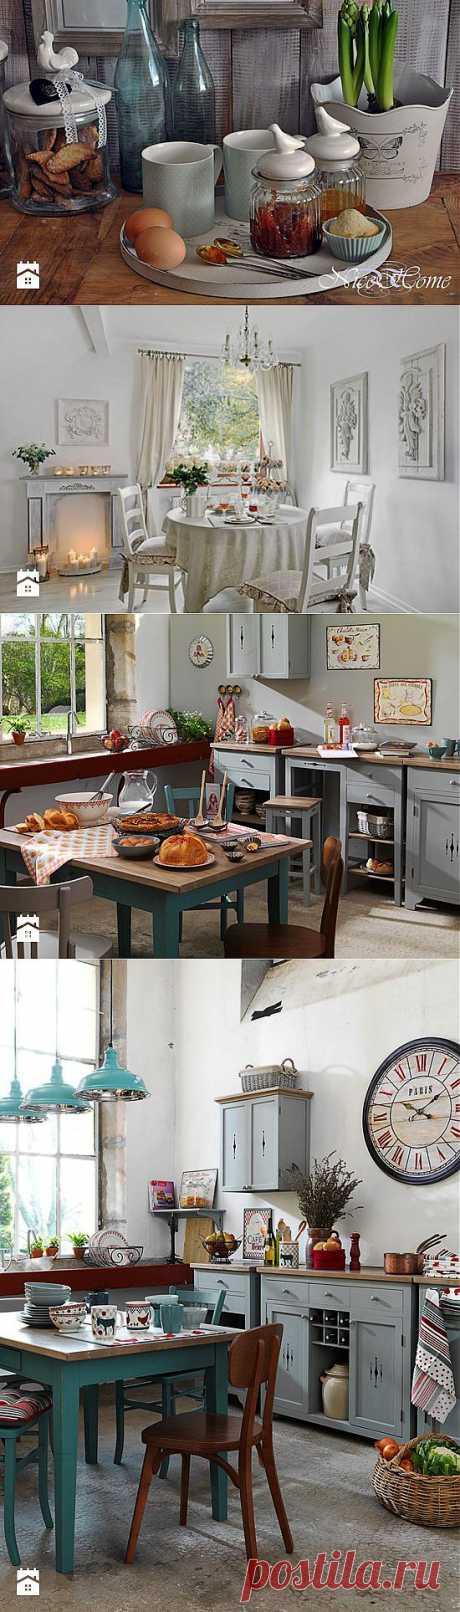 biel+ blu - dan49 - projekty, aranżacje, design - Homebook